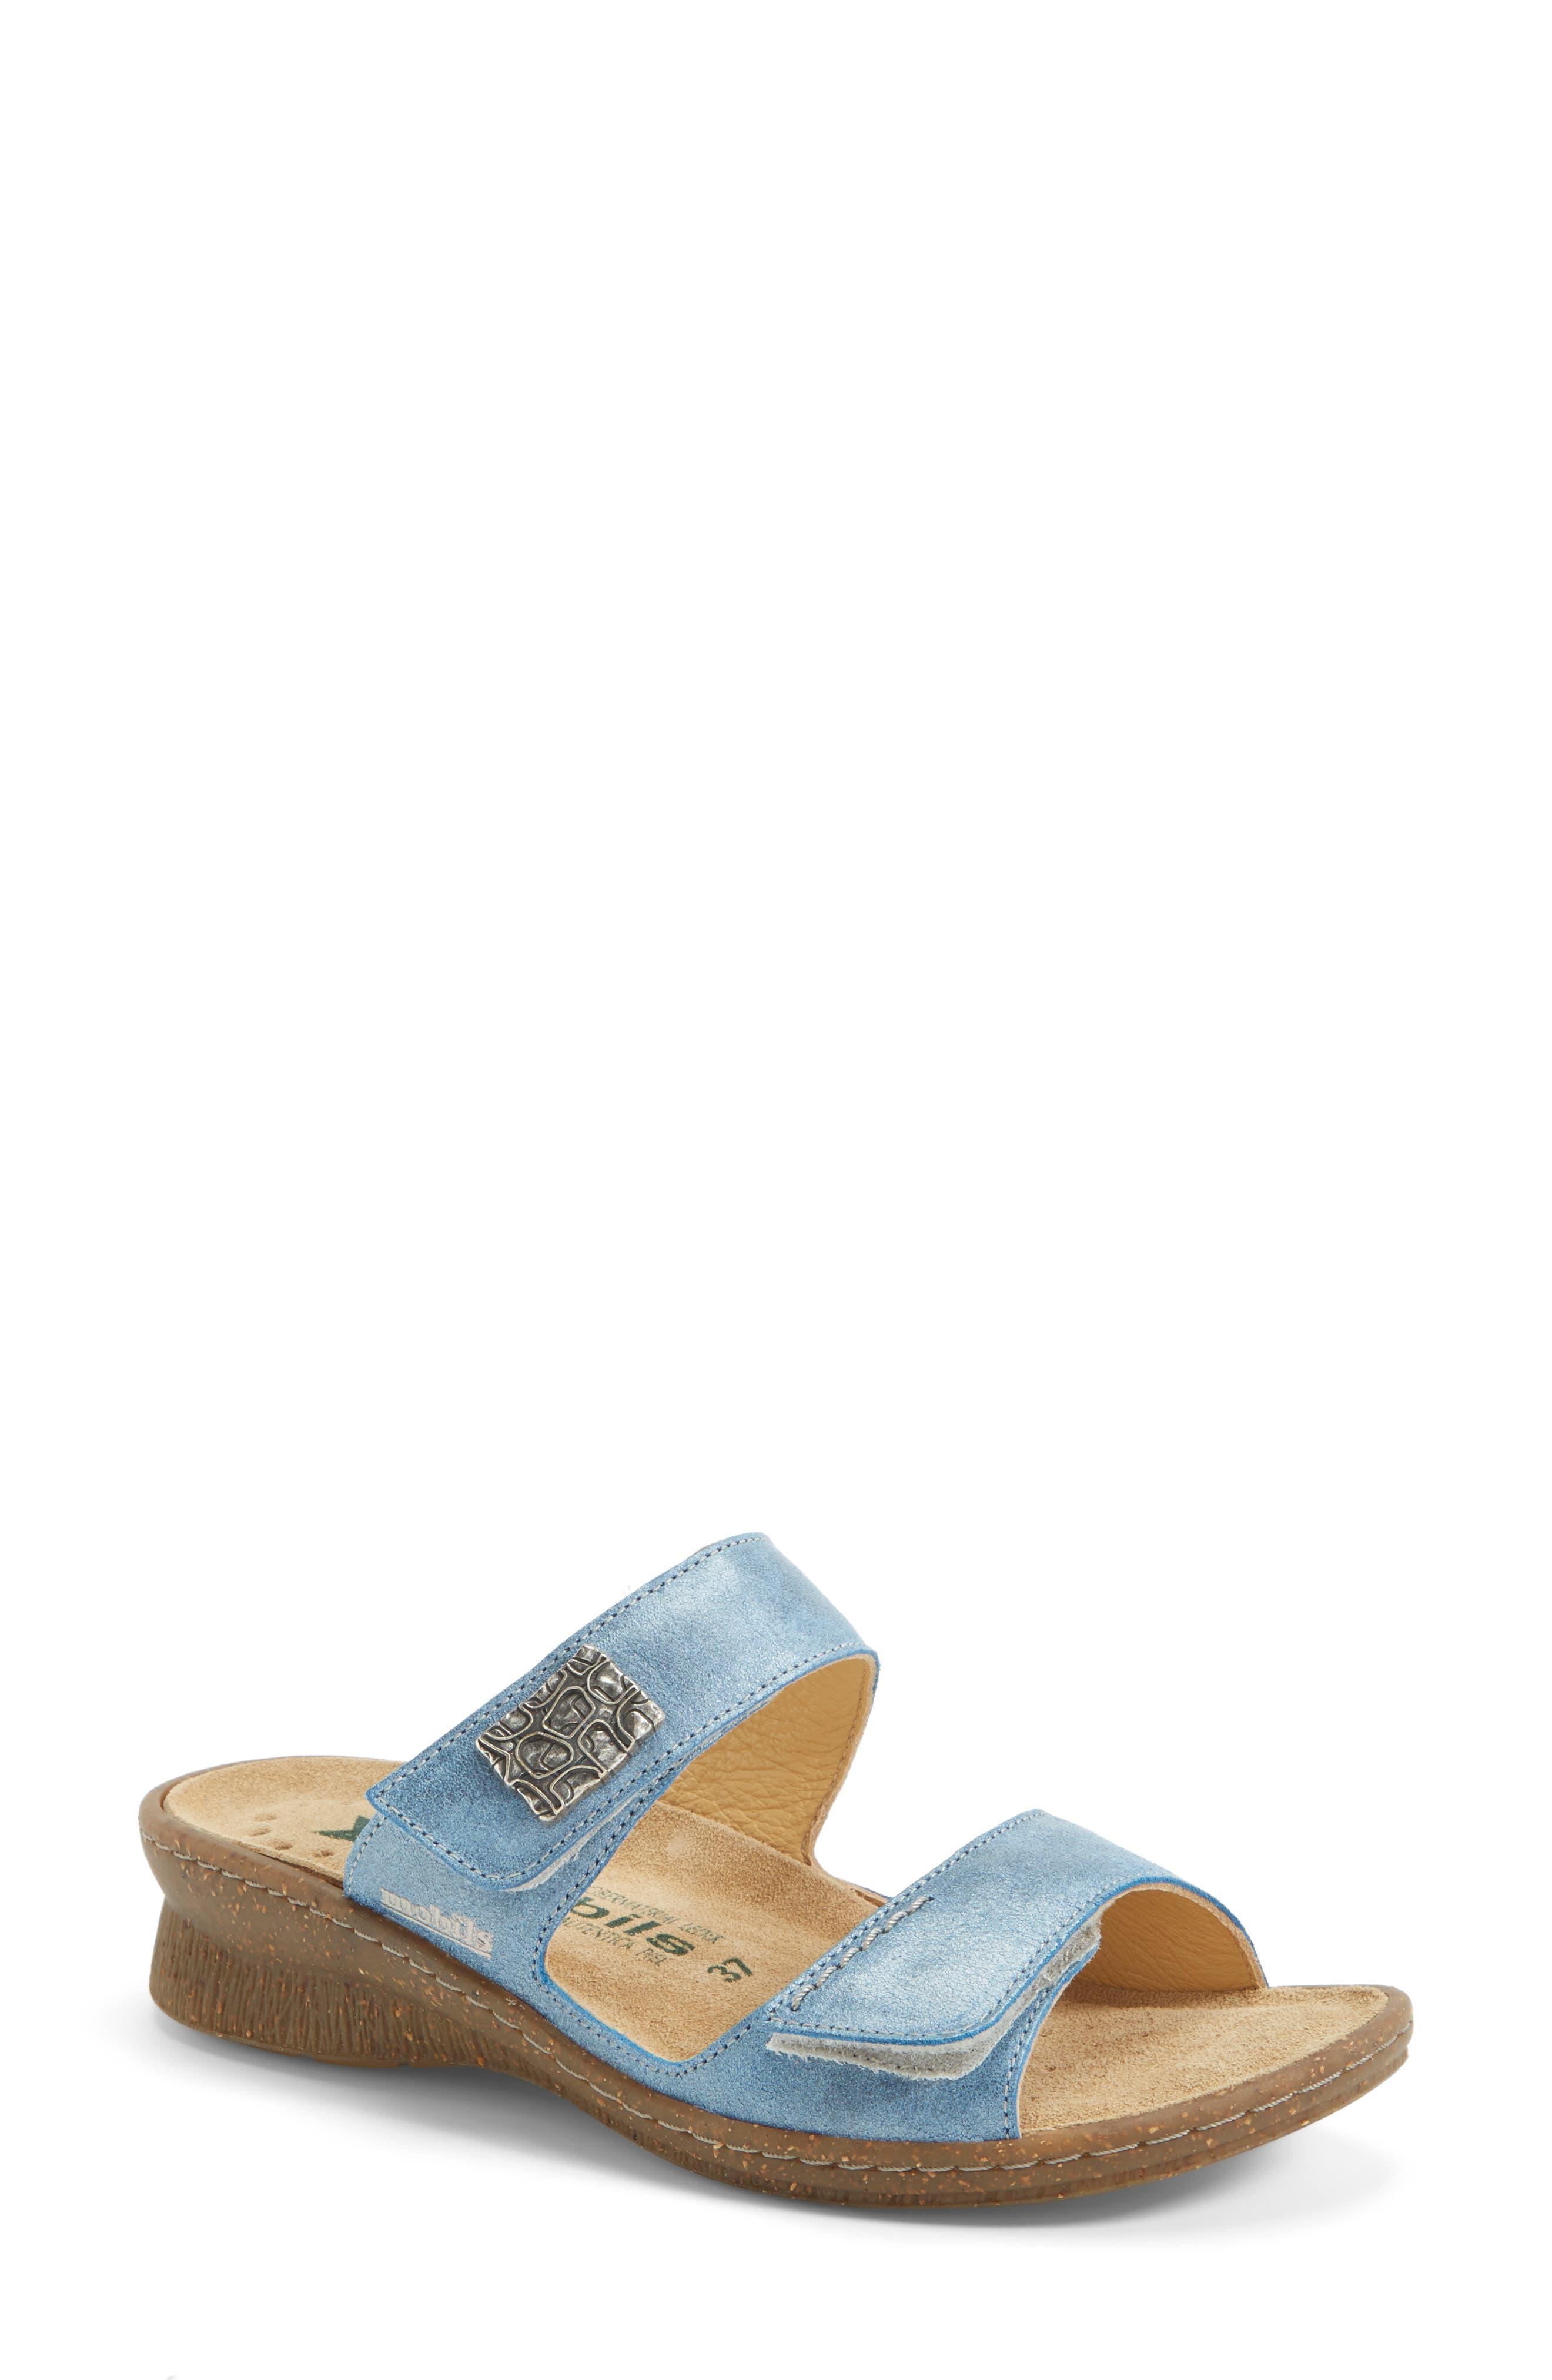 'Bregalia' Metallic Leather Sandal,                             Alternate thumbnail 4, color,                             400